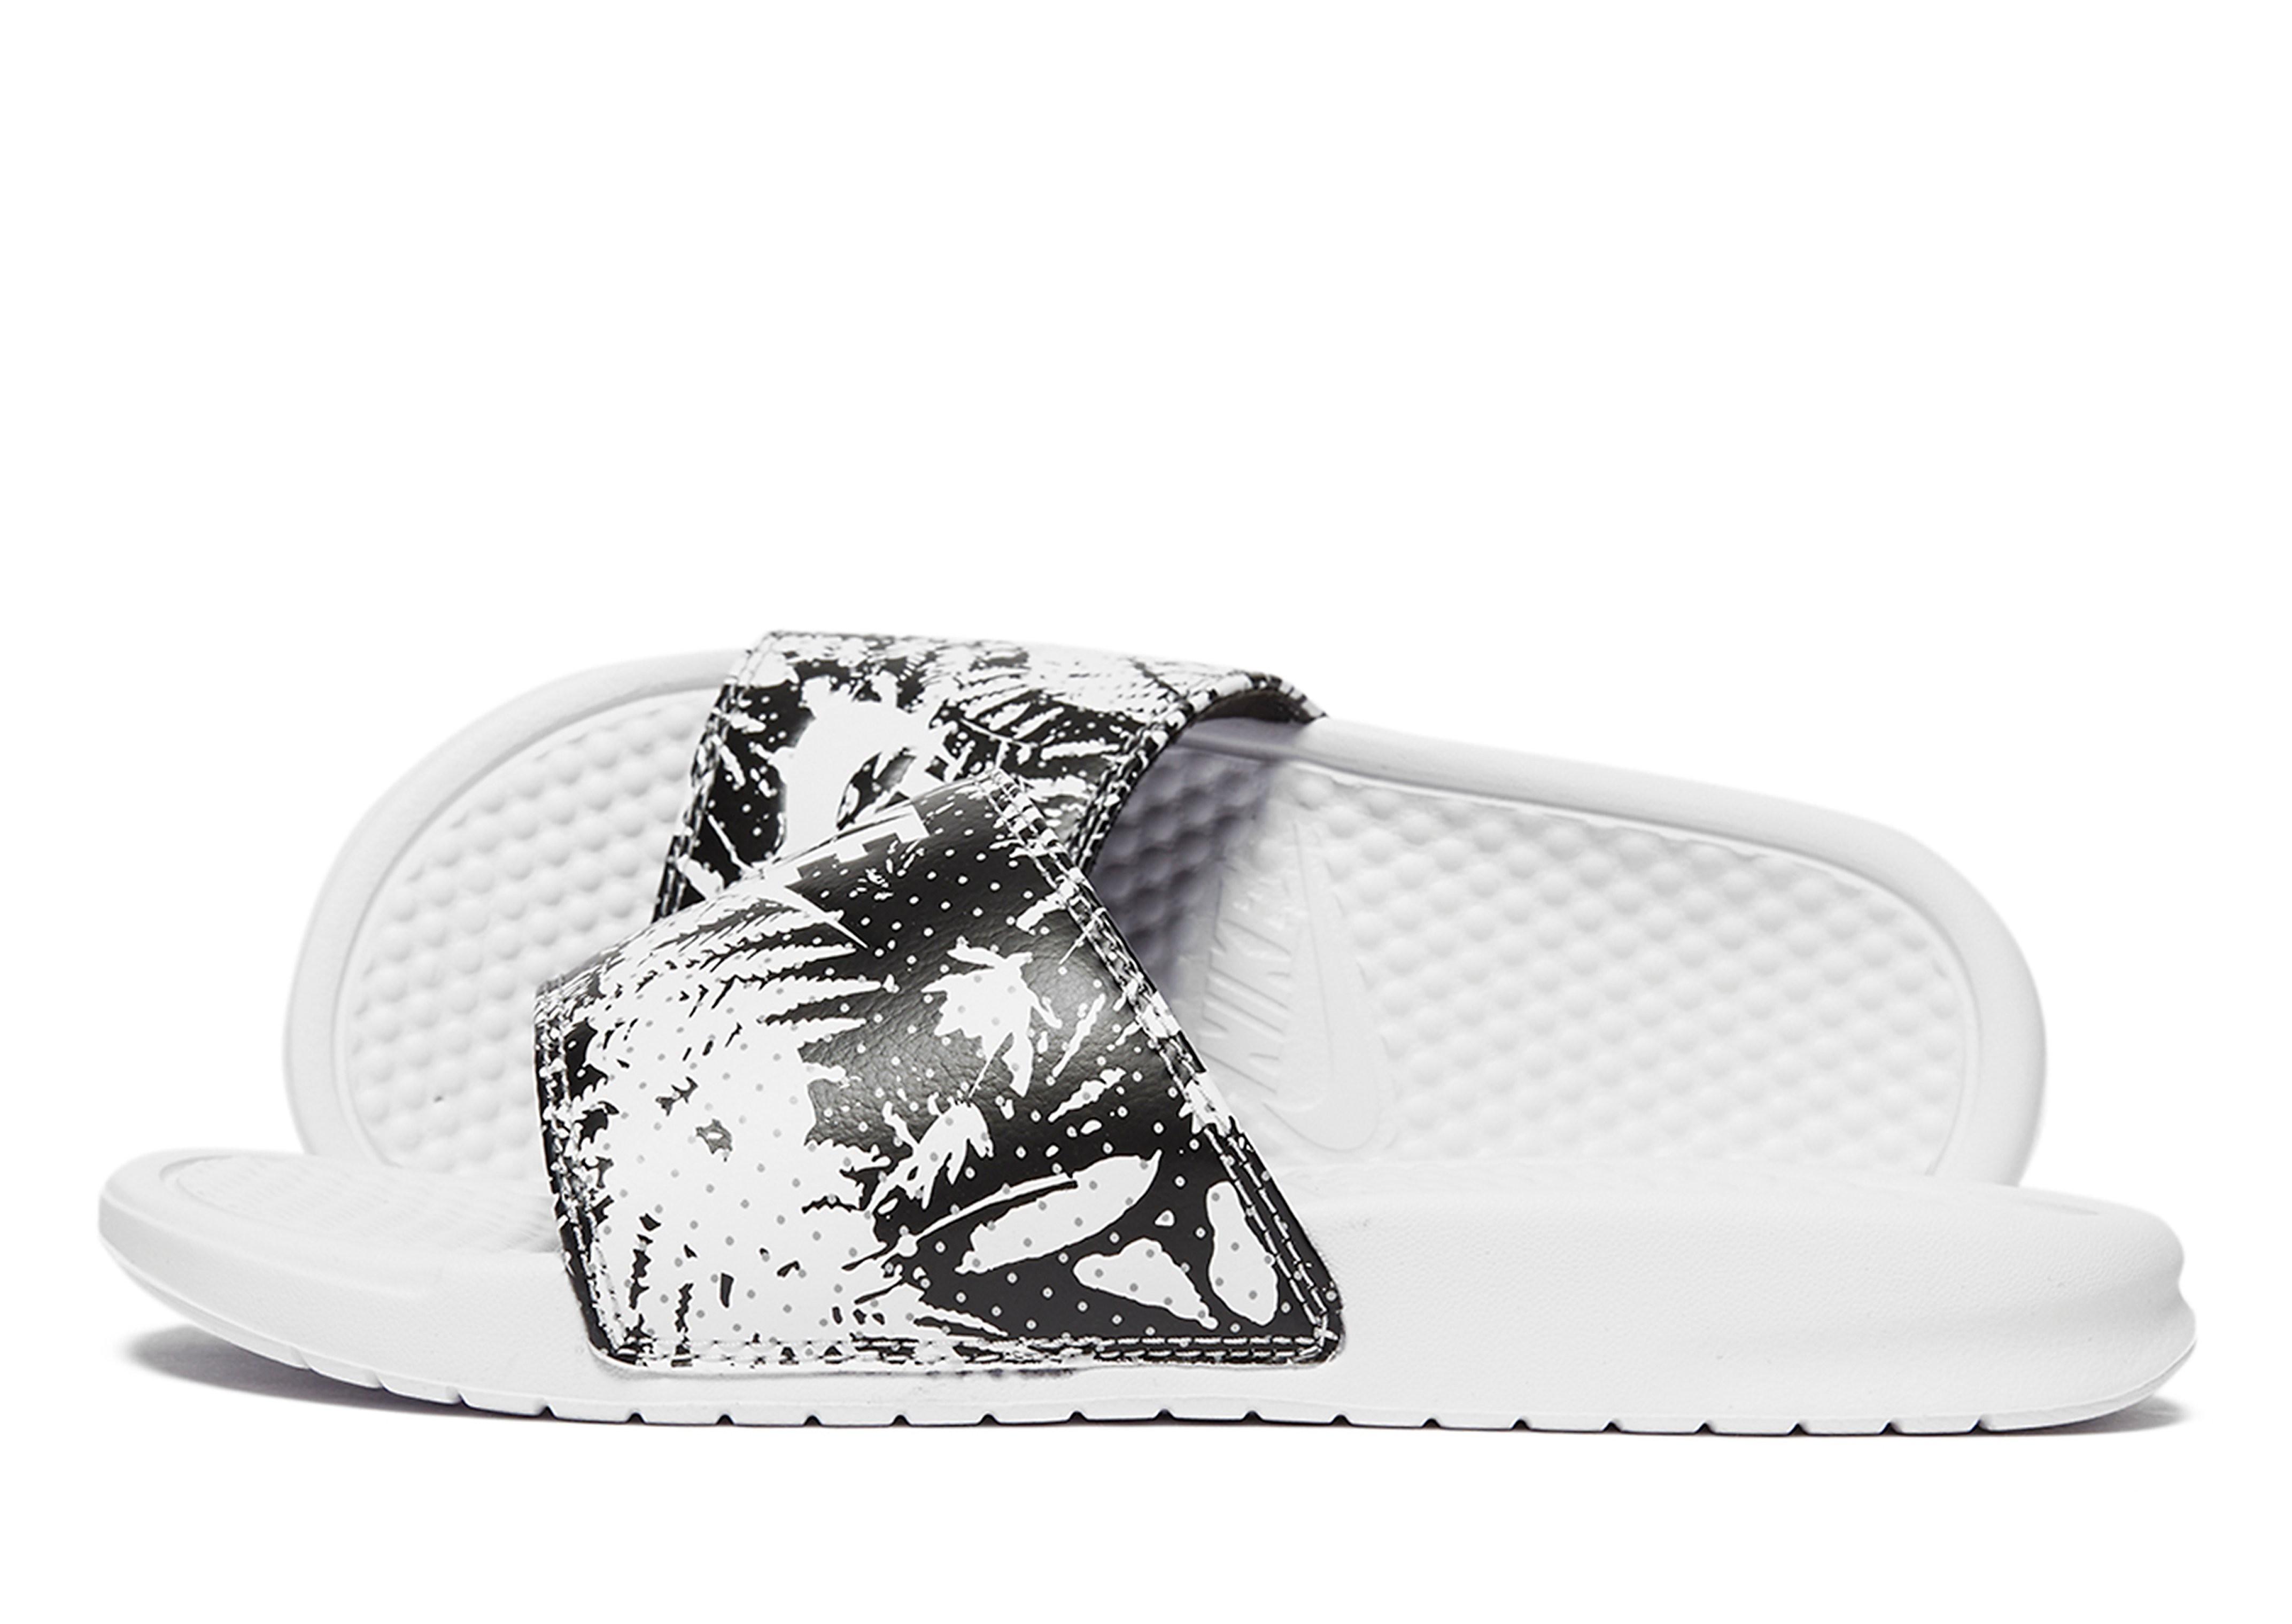 Nike Benassi Just Do It Print Slides Women's